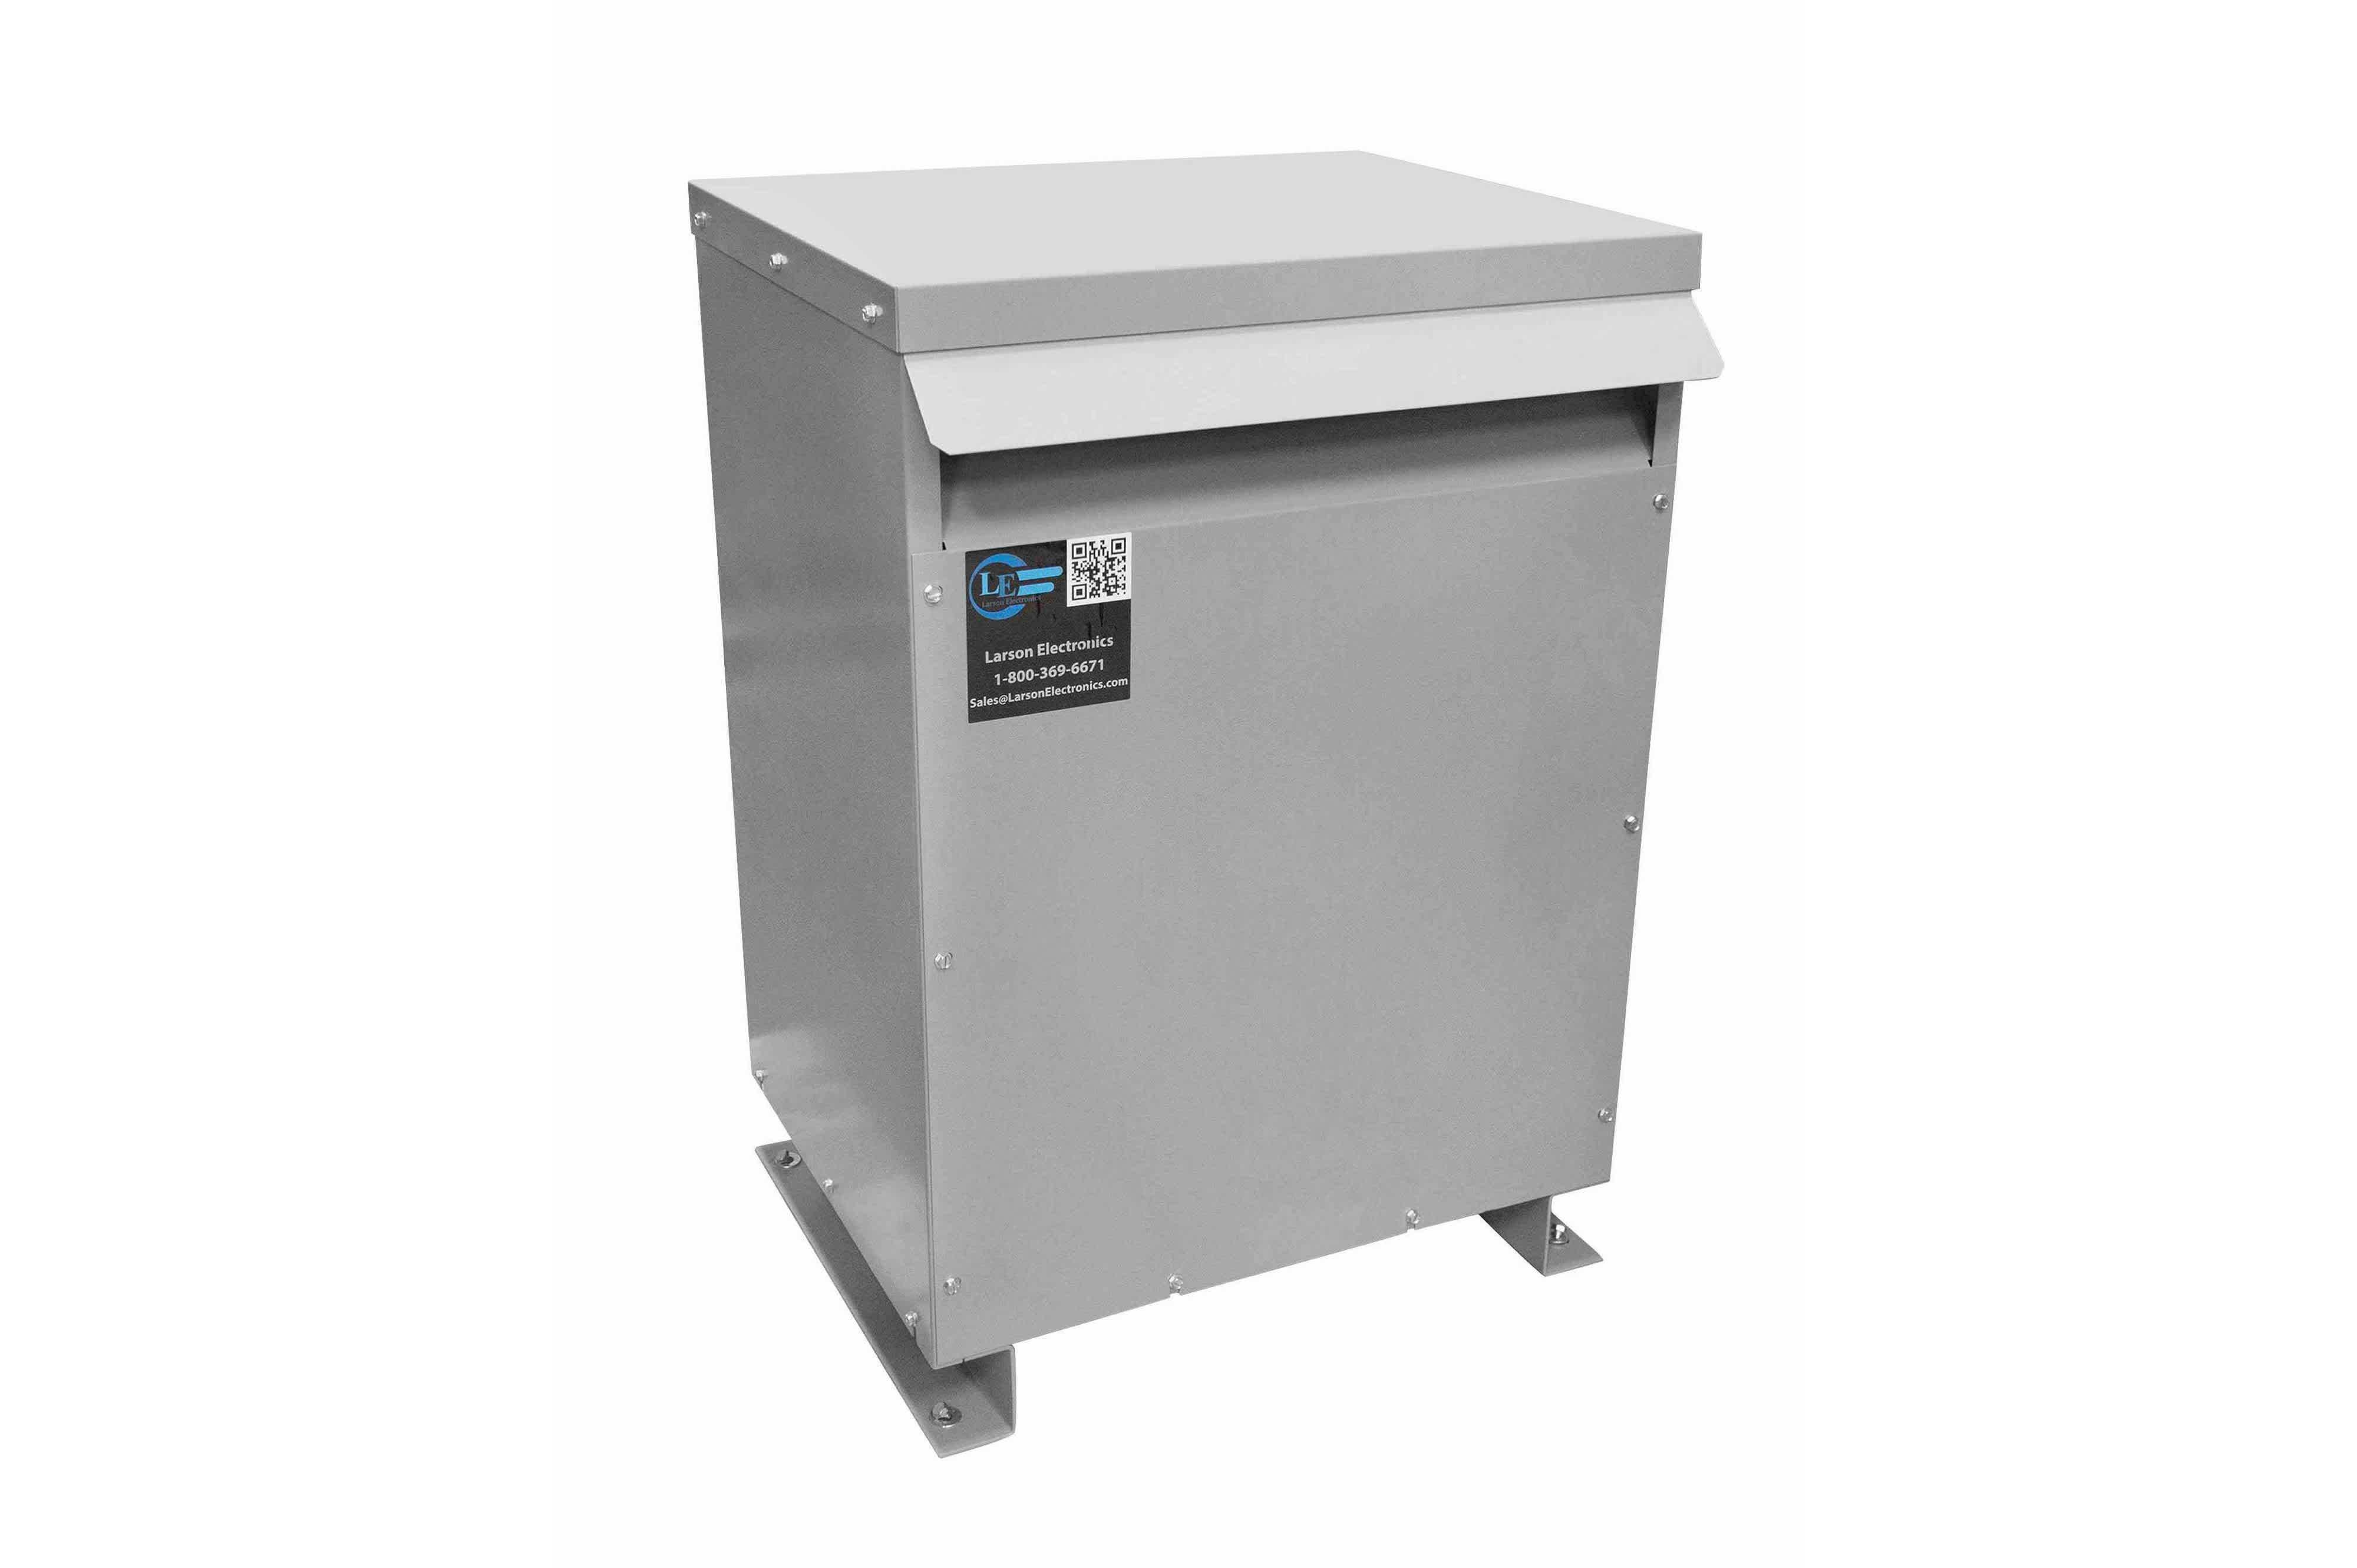 38 kVA 3PH Isolation Transformer, 208V Wye Primary, 240V/120 Delta Secondary, N3R, Ventilated, 60 Hz